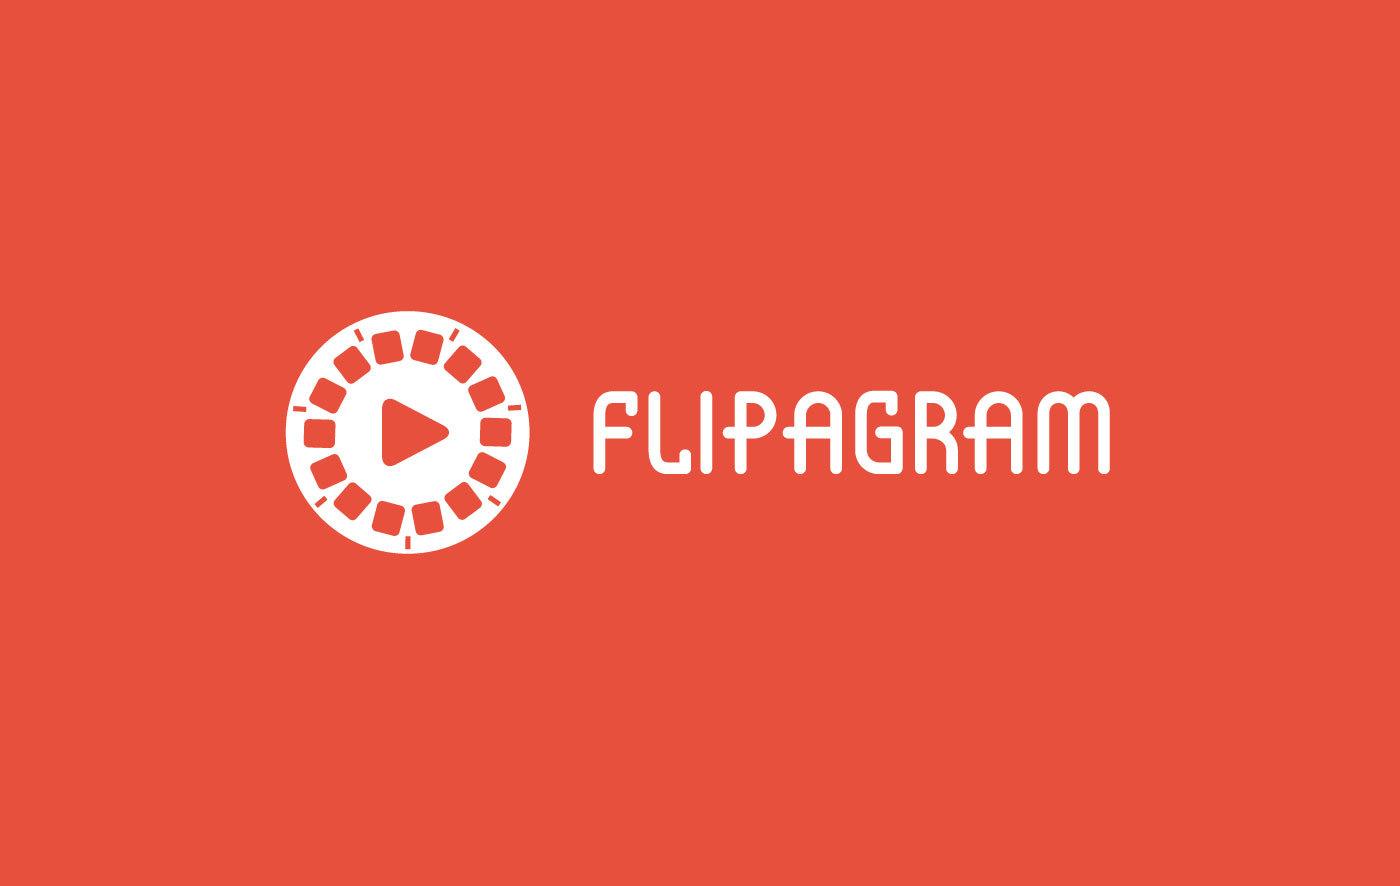 Flipagram Brand Identity / Logo by Sabet Brands, Inc.